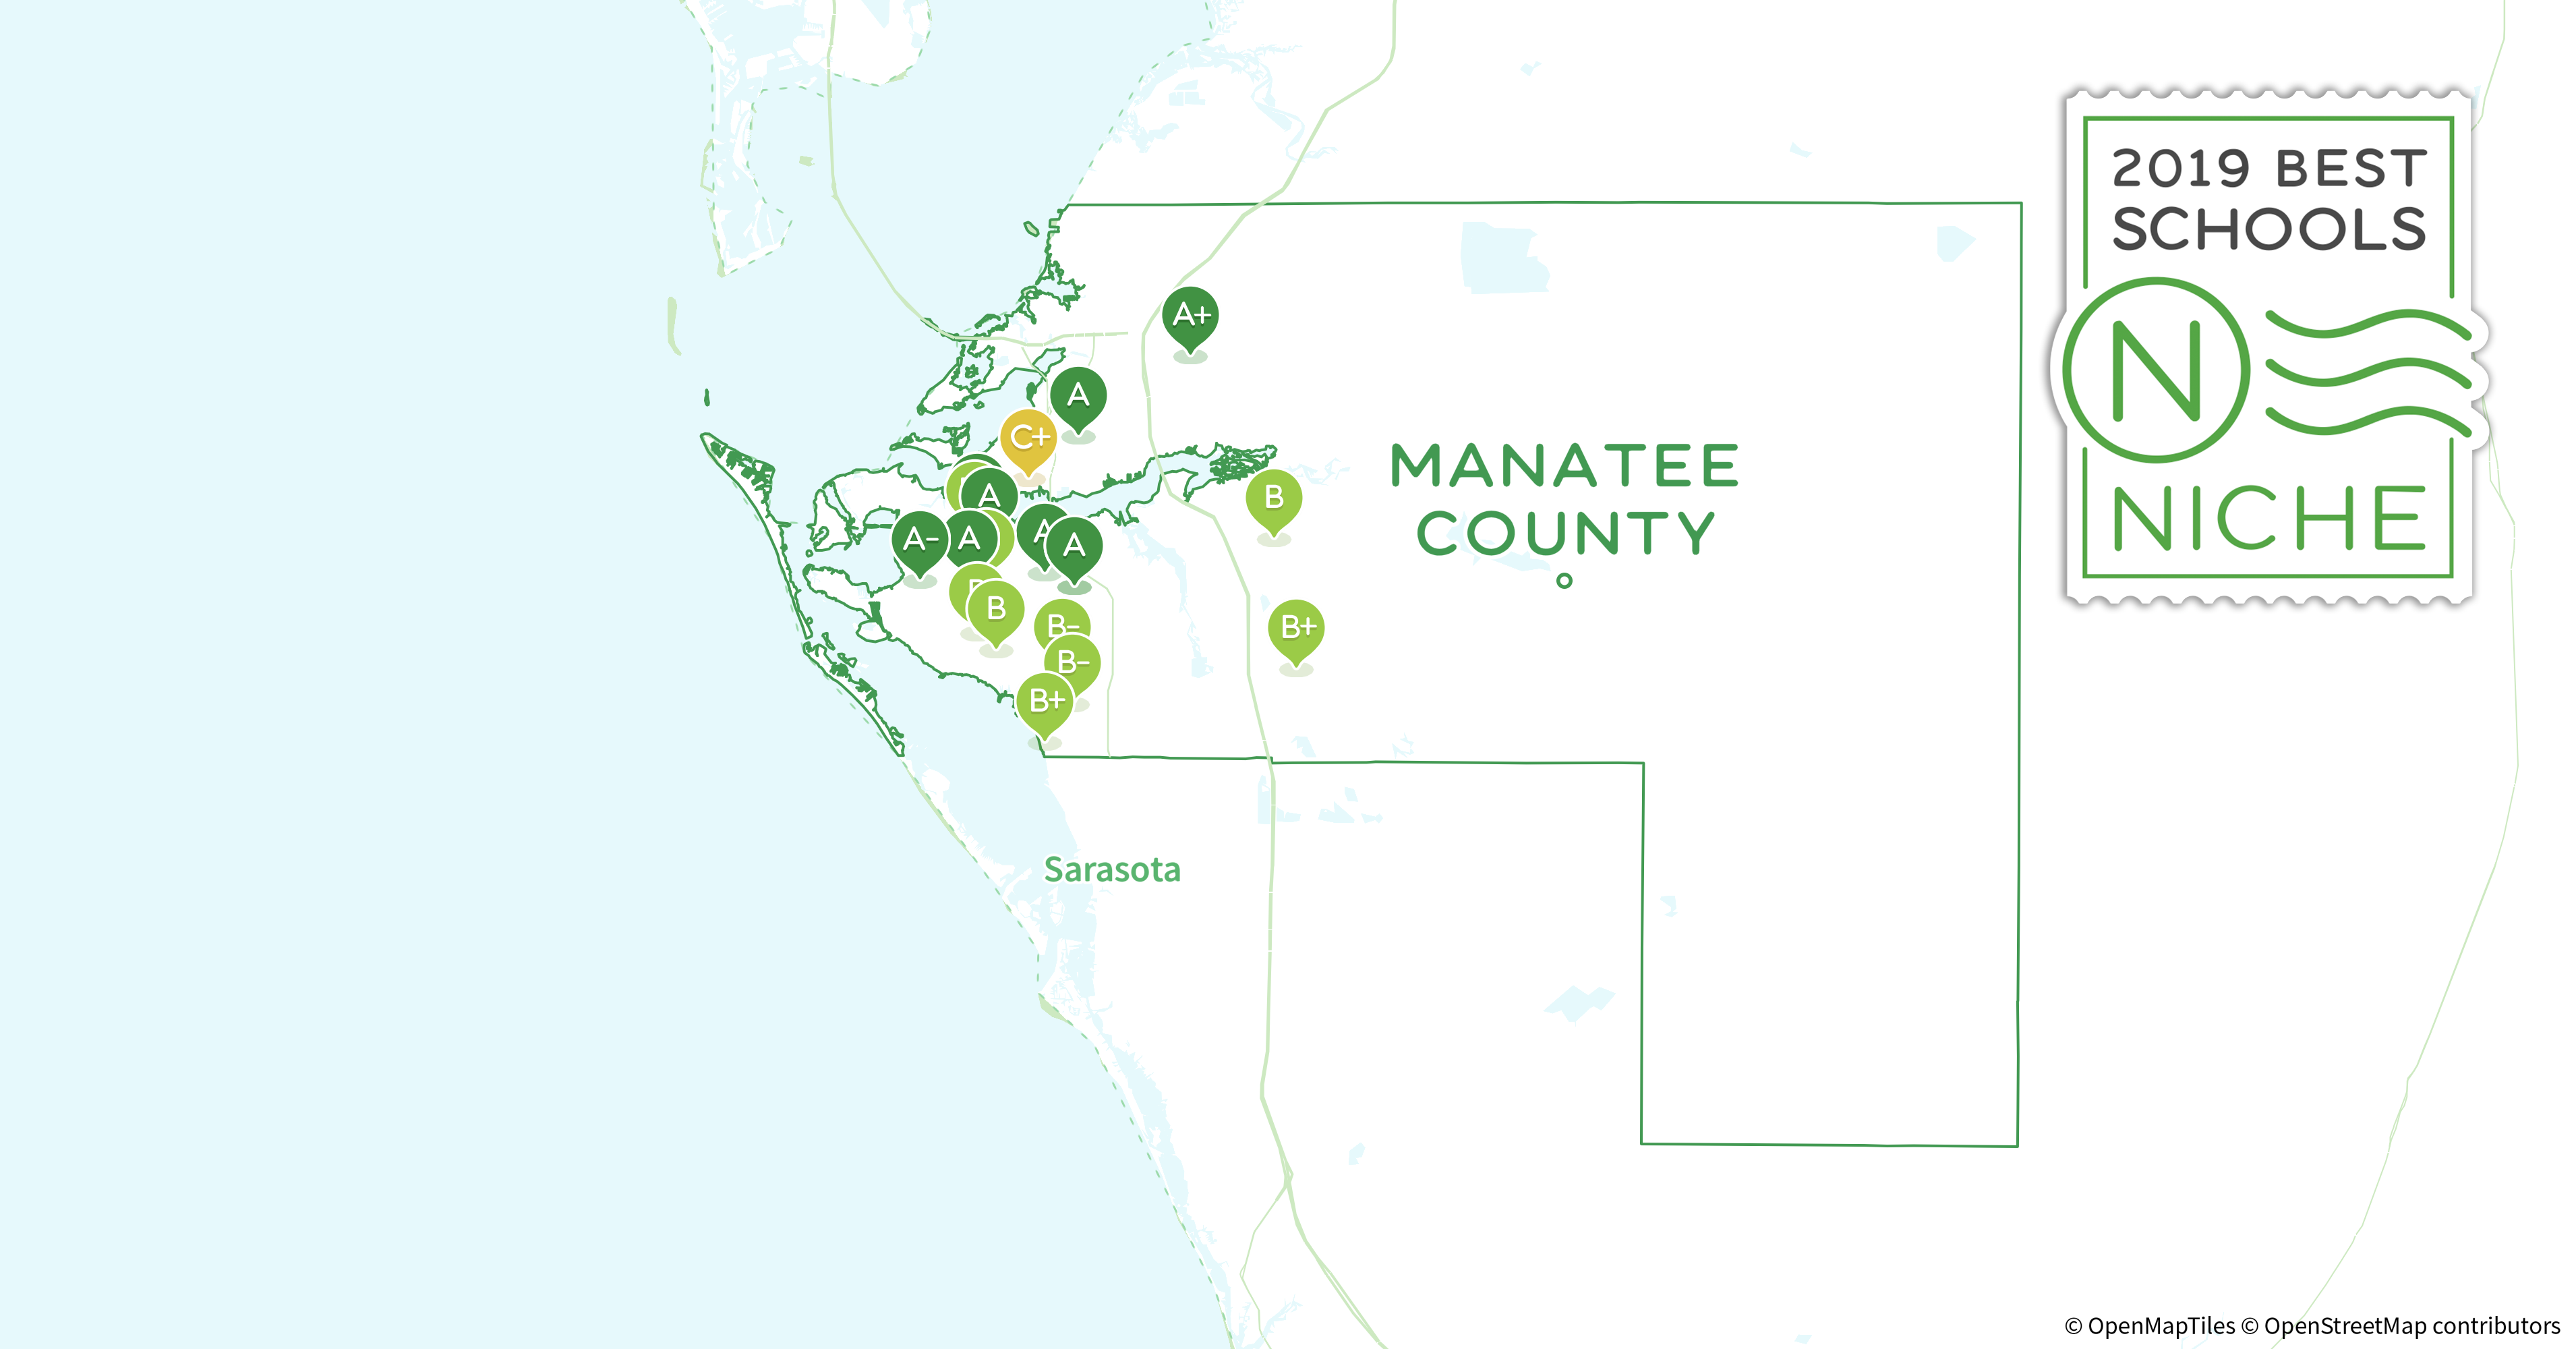 2019 Best Public High Schools In Manatee County Fl Niche